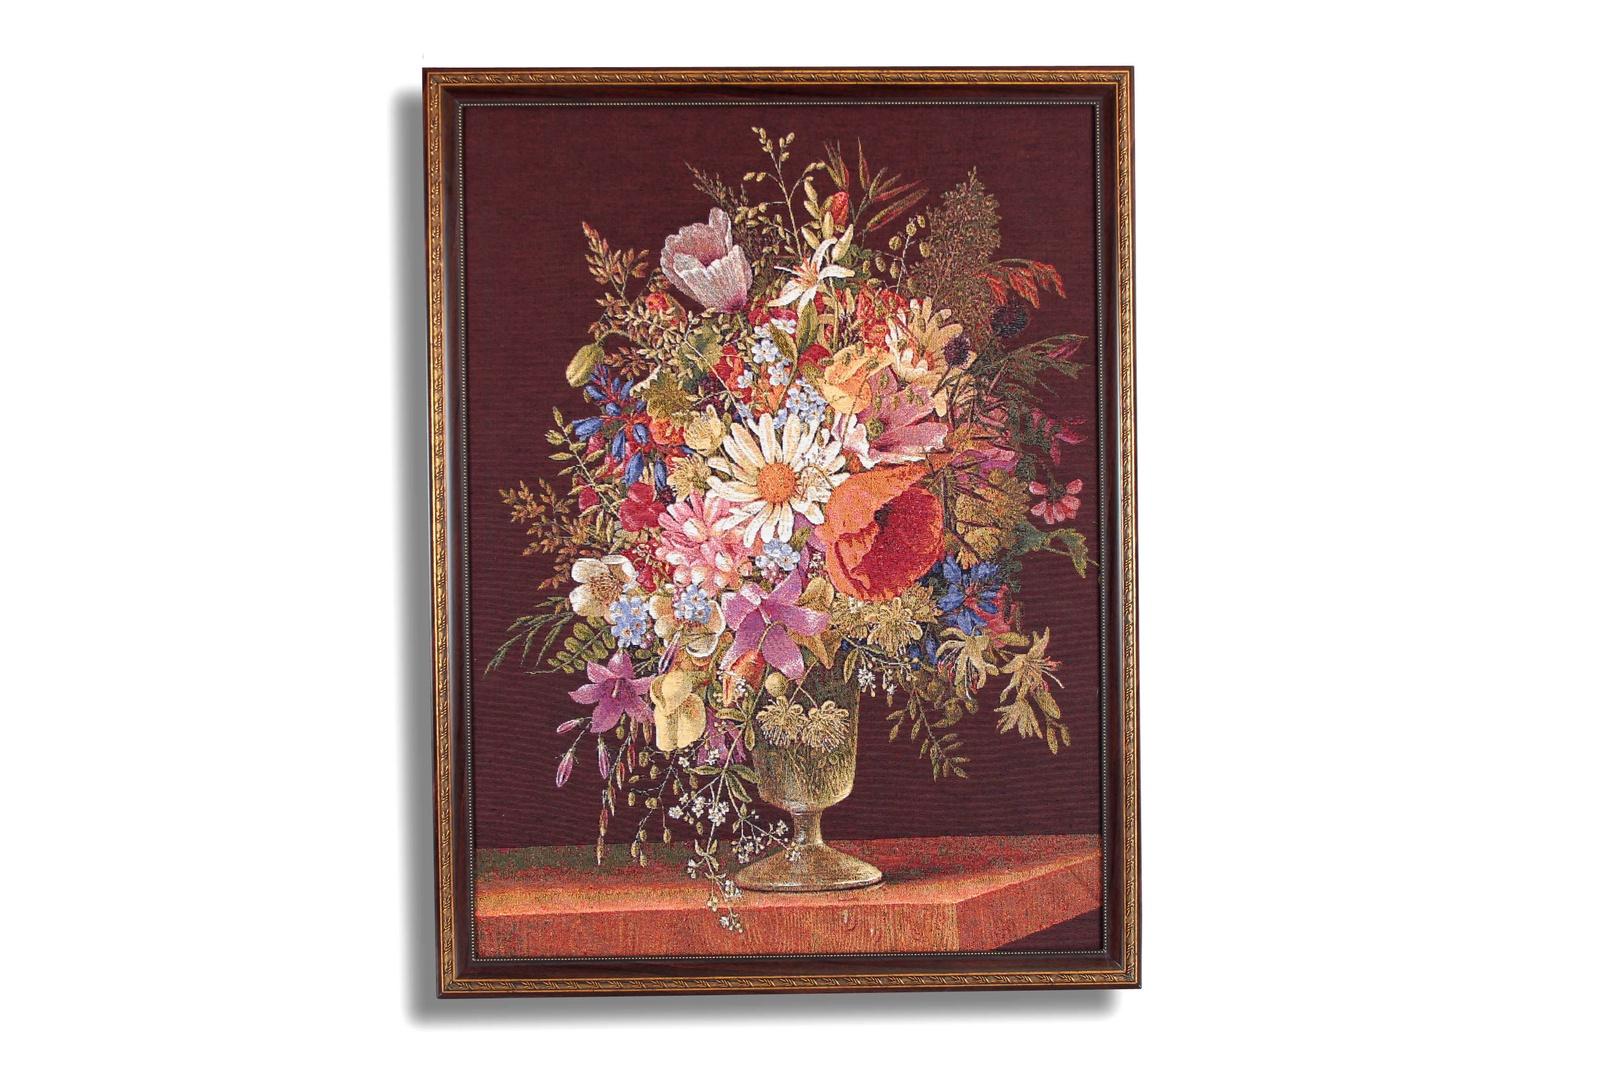 Фото - Картина Магазин гобеленов букет ромашки и маки 69*90см, Гобелен гобелен картина интерьерная магазин гобеленов букет роз бордюр 65 на 85 см